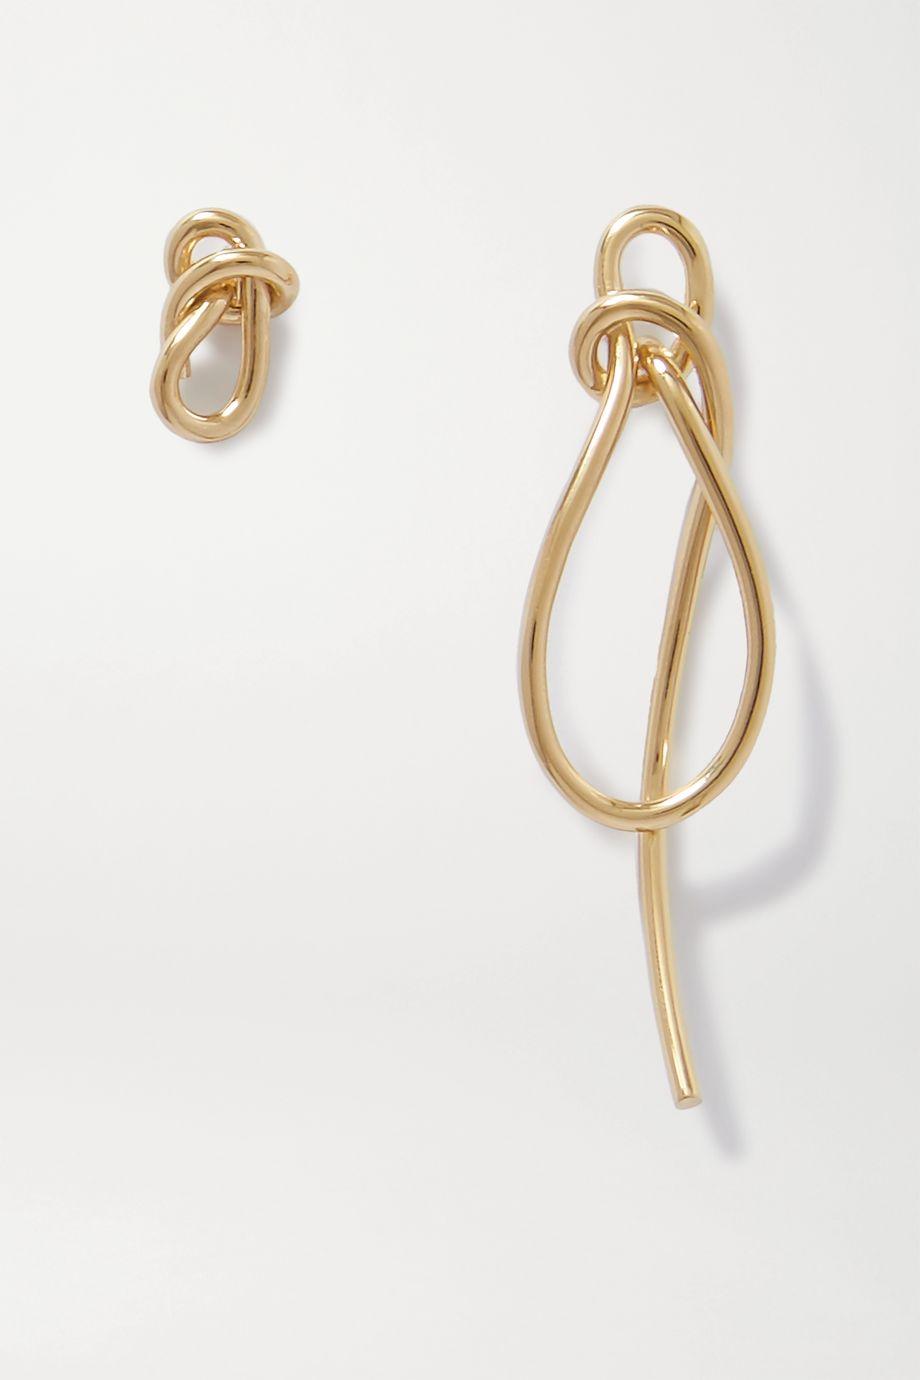 Completedworks Thread gold vermeil earrings